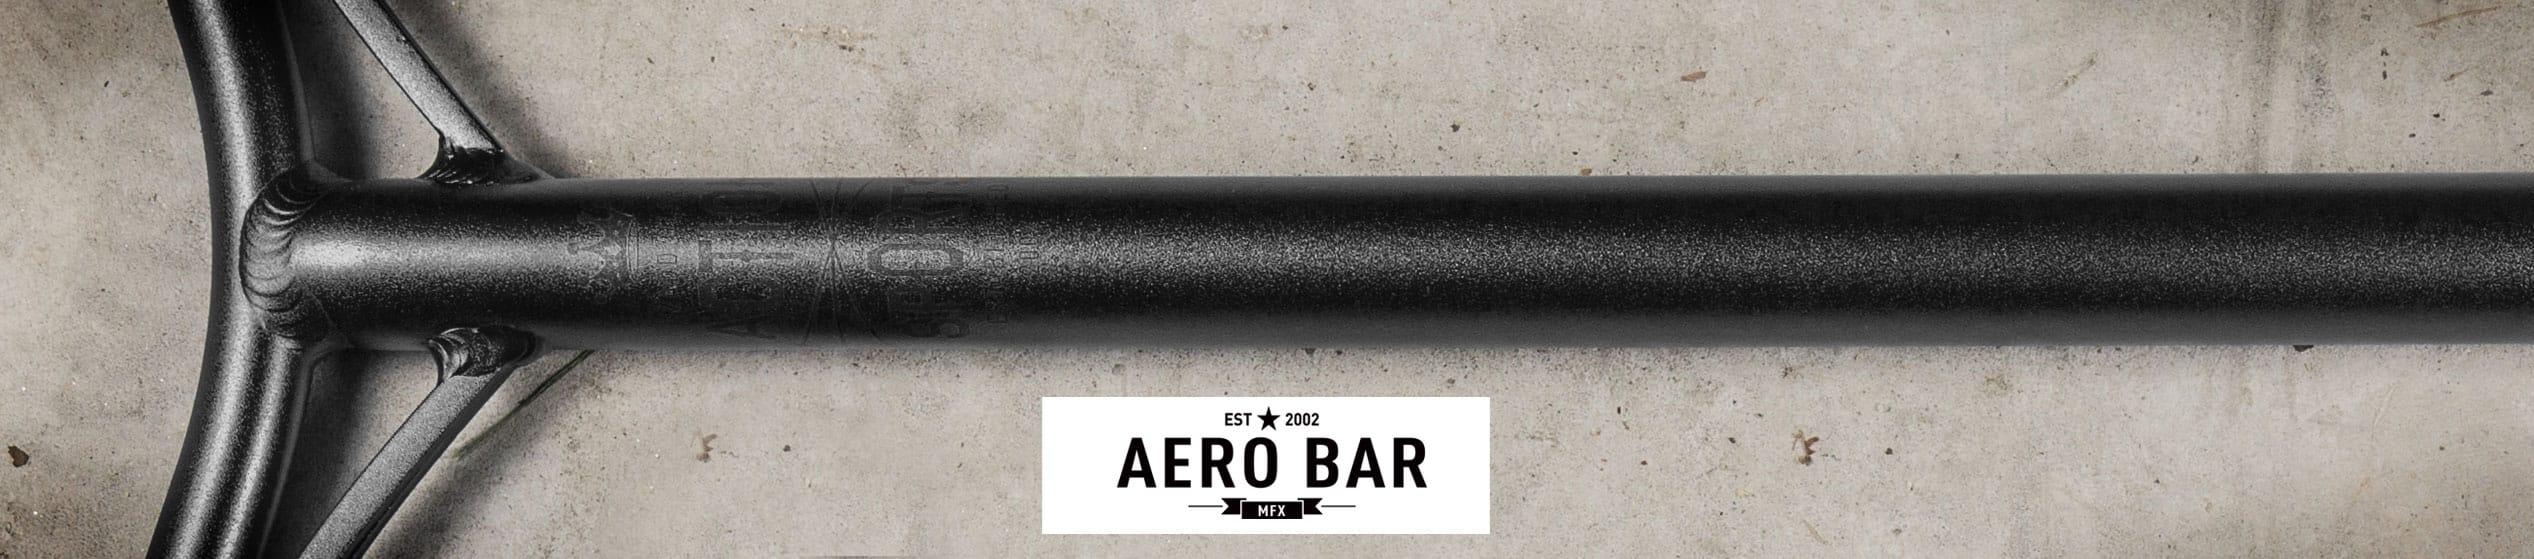 MGP Mfx AERO SCOOTER Bar-Nero Opaco in Lega